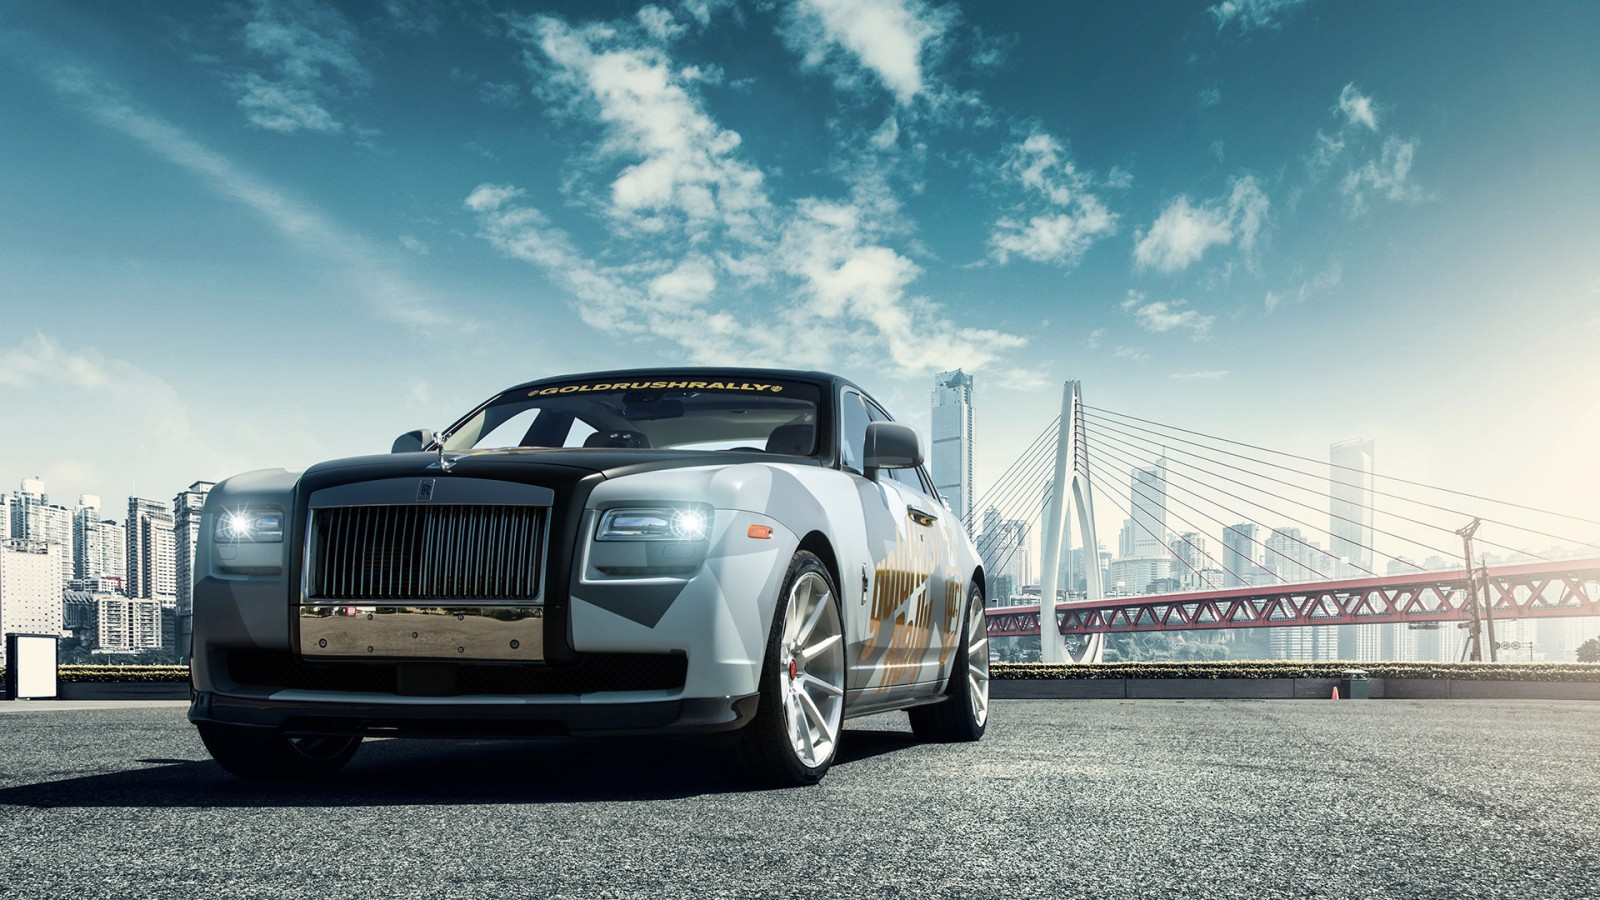 2016 Rolls Royce Ghost >> 2016 Vorsteiner Rolls Royce Ghost Aero Wallpaper | HD Car ...